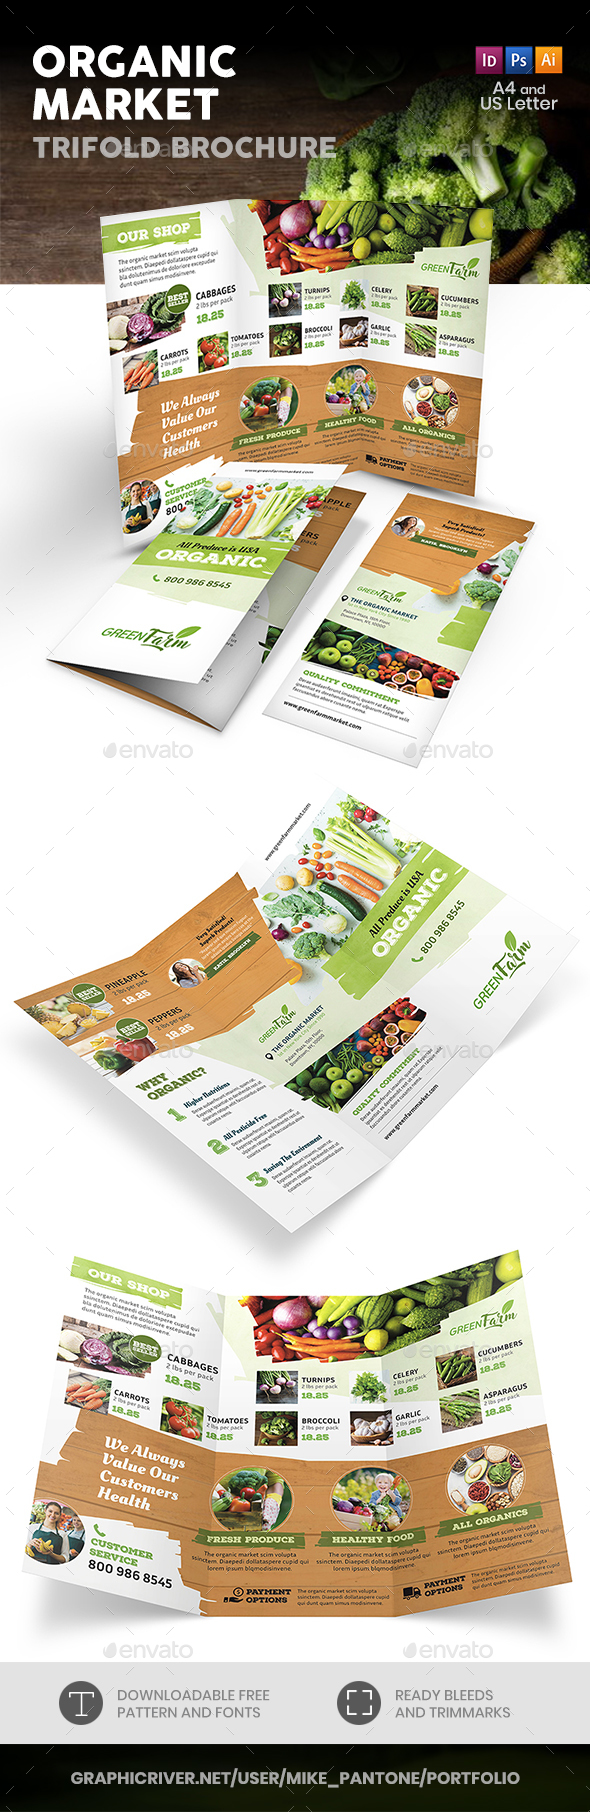 Organic Market Trifold Brochure 3 - Informational Brochures